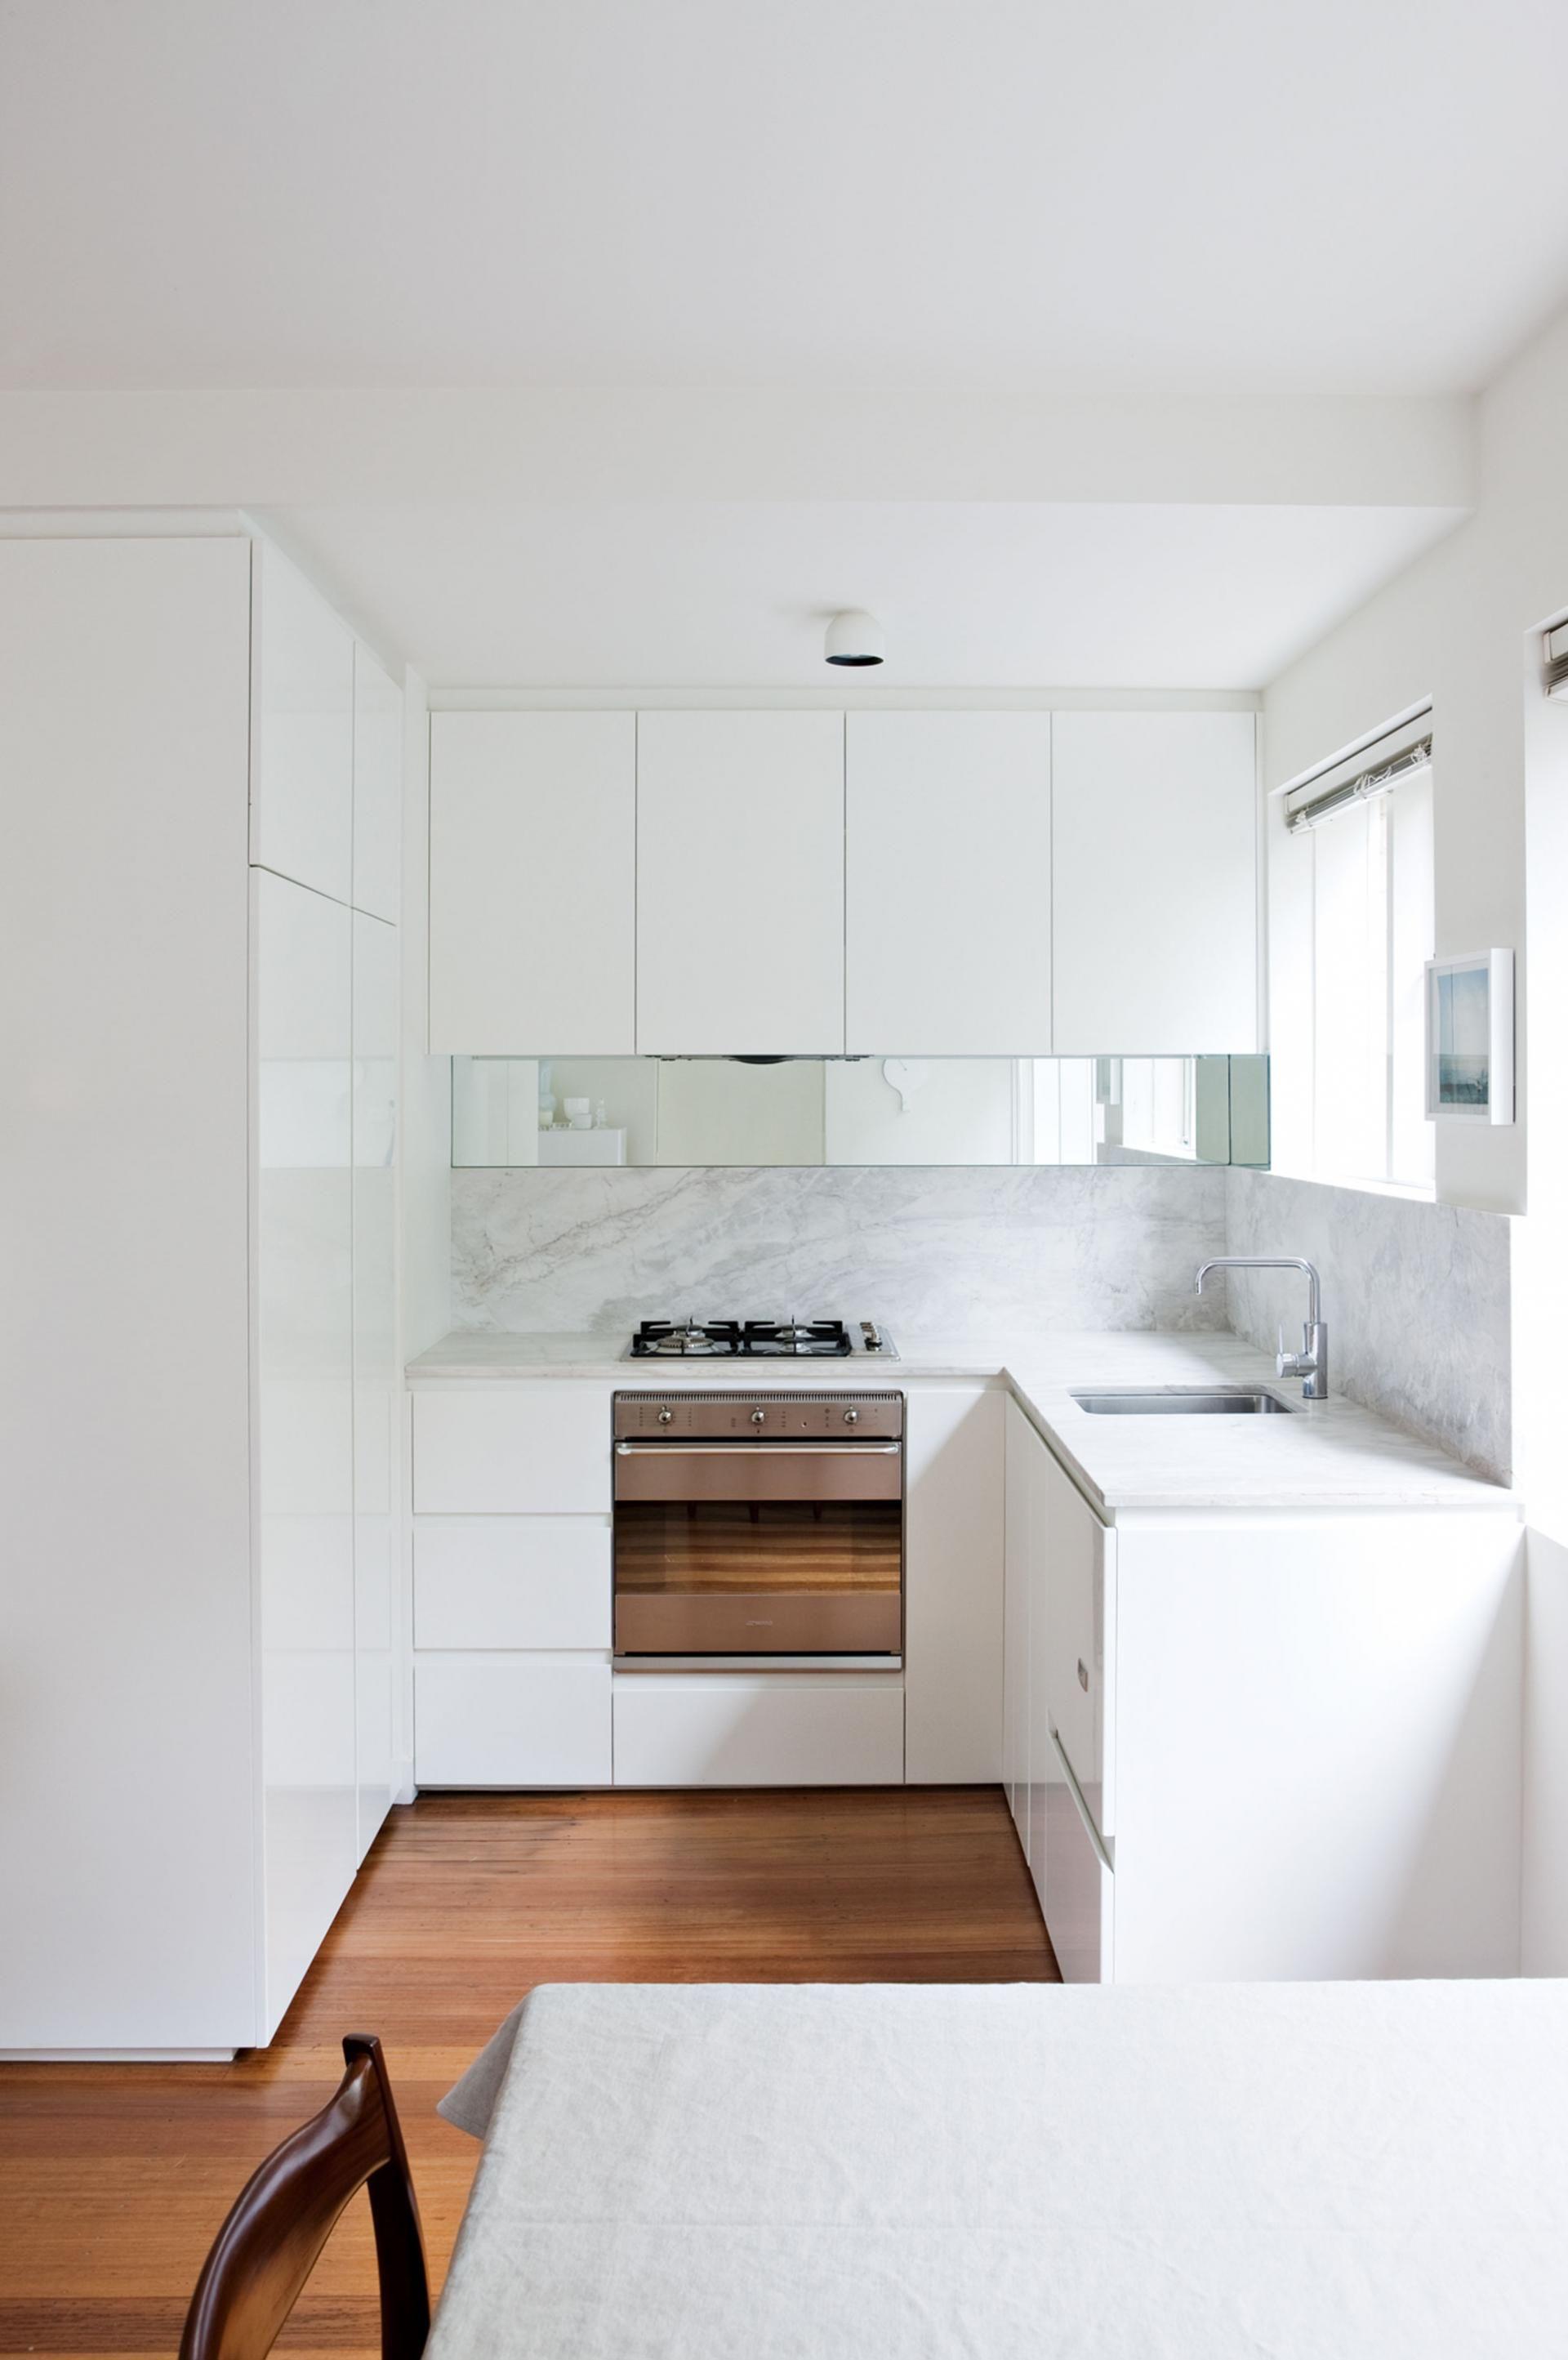 Small Kitchen Design Ideasphotographyjason Buschstyling Amazing Small Kitchen Interior Design Inspiration Design